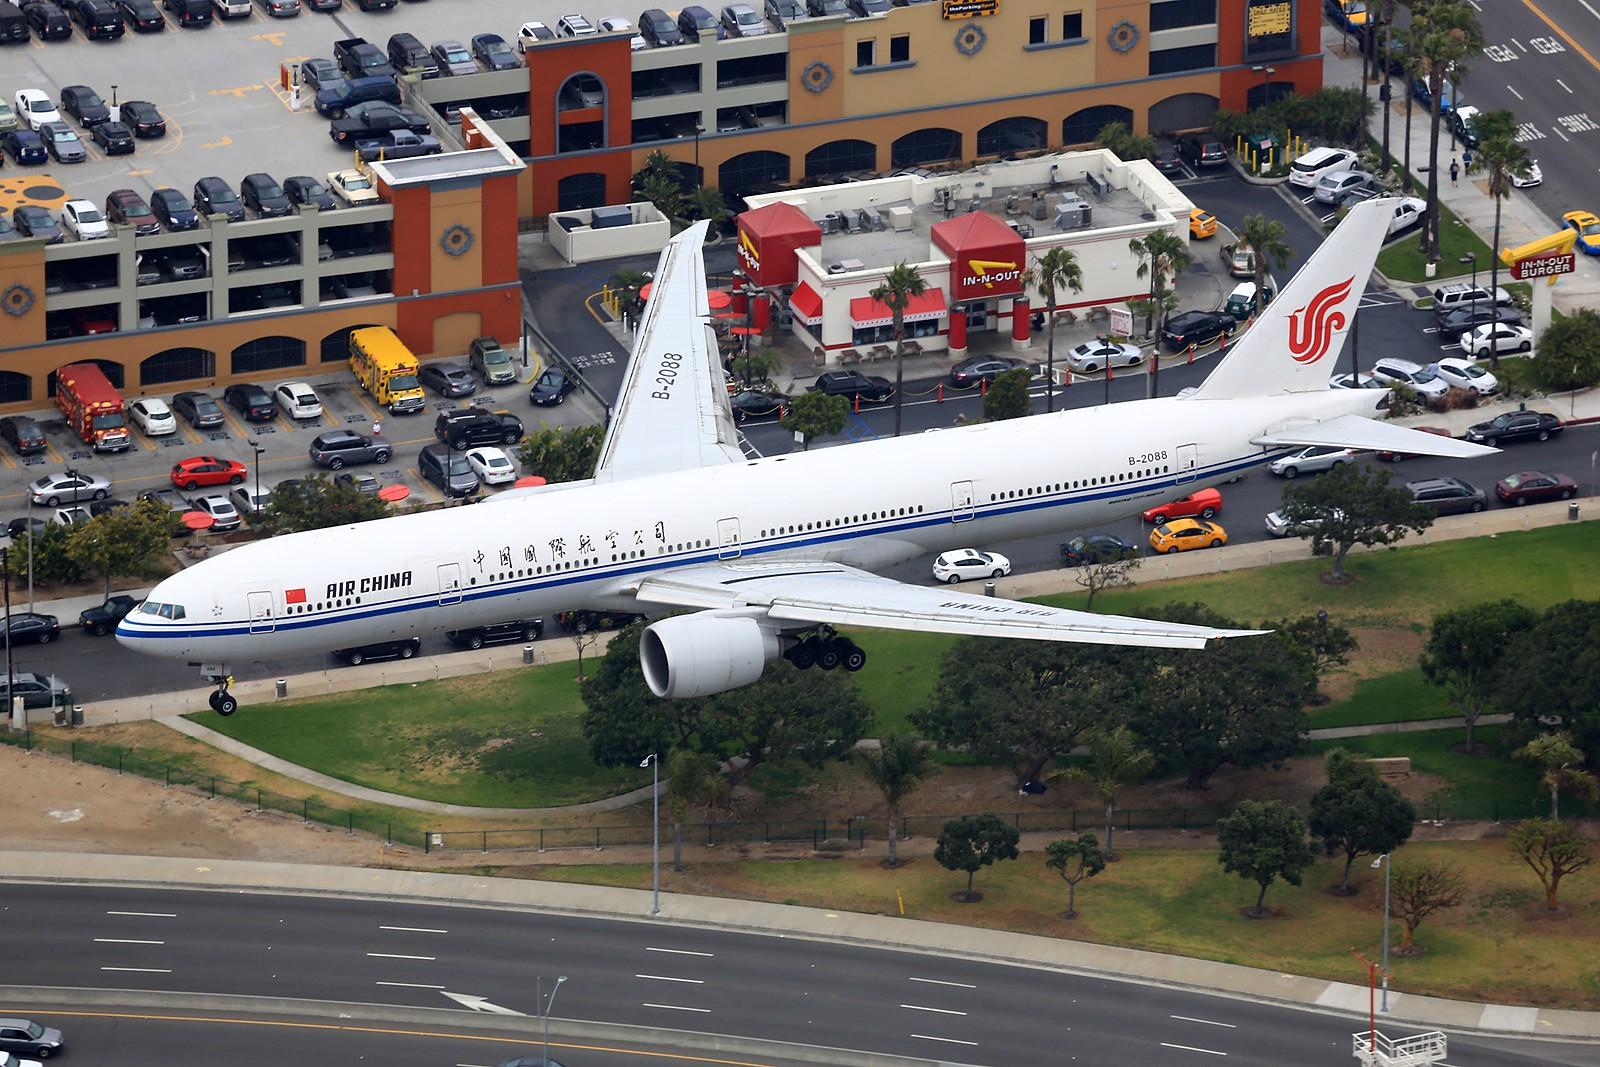 Re:[原创]【LAX】**********777级了,空对空&空对地部分777合集[1600*1067]********** BOEING 777-300ER B-2088 美国洛杉矶机场